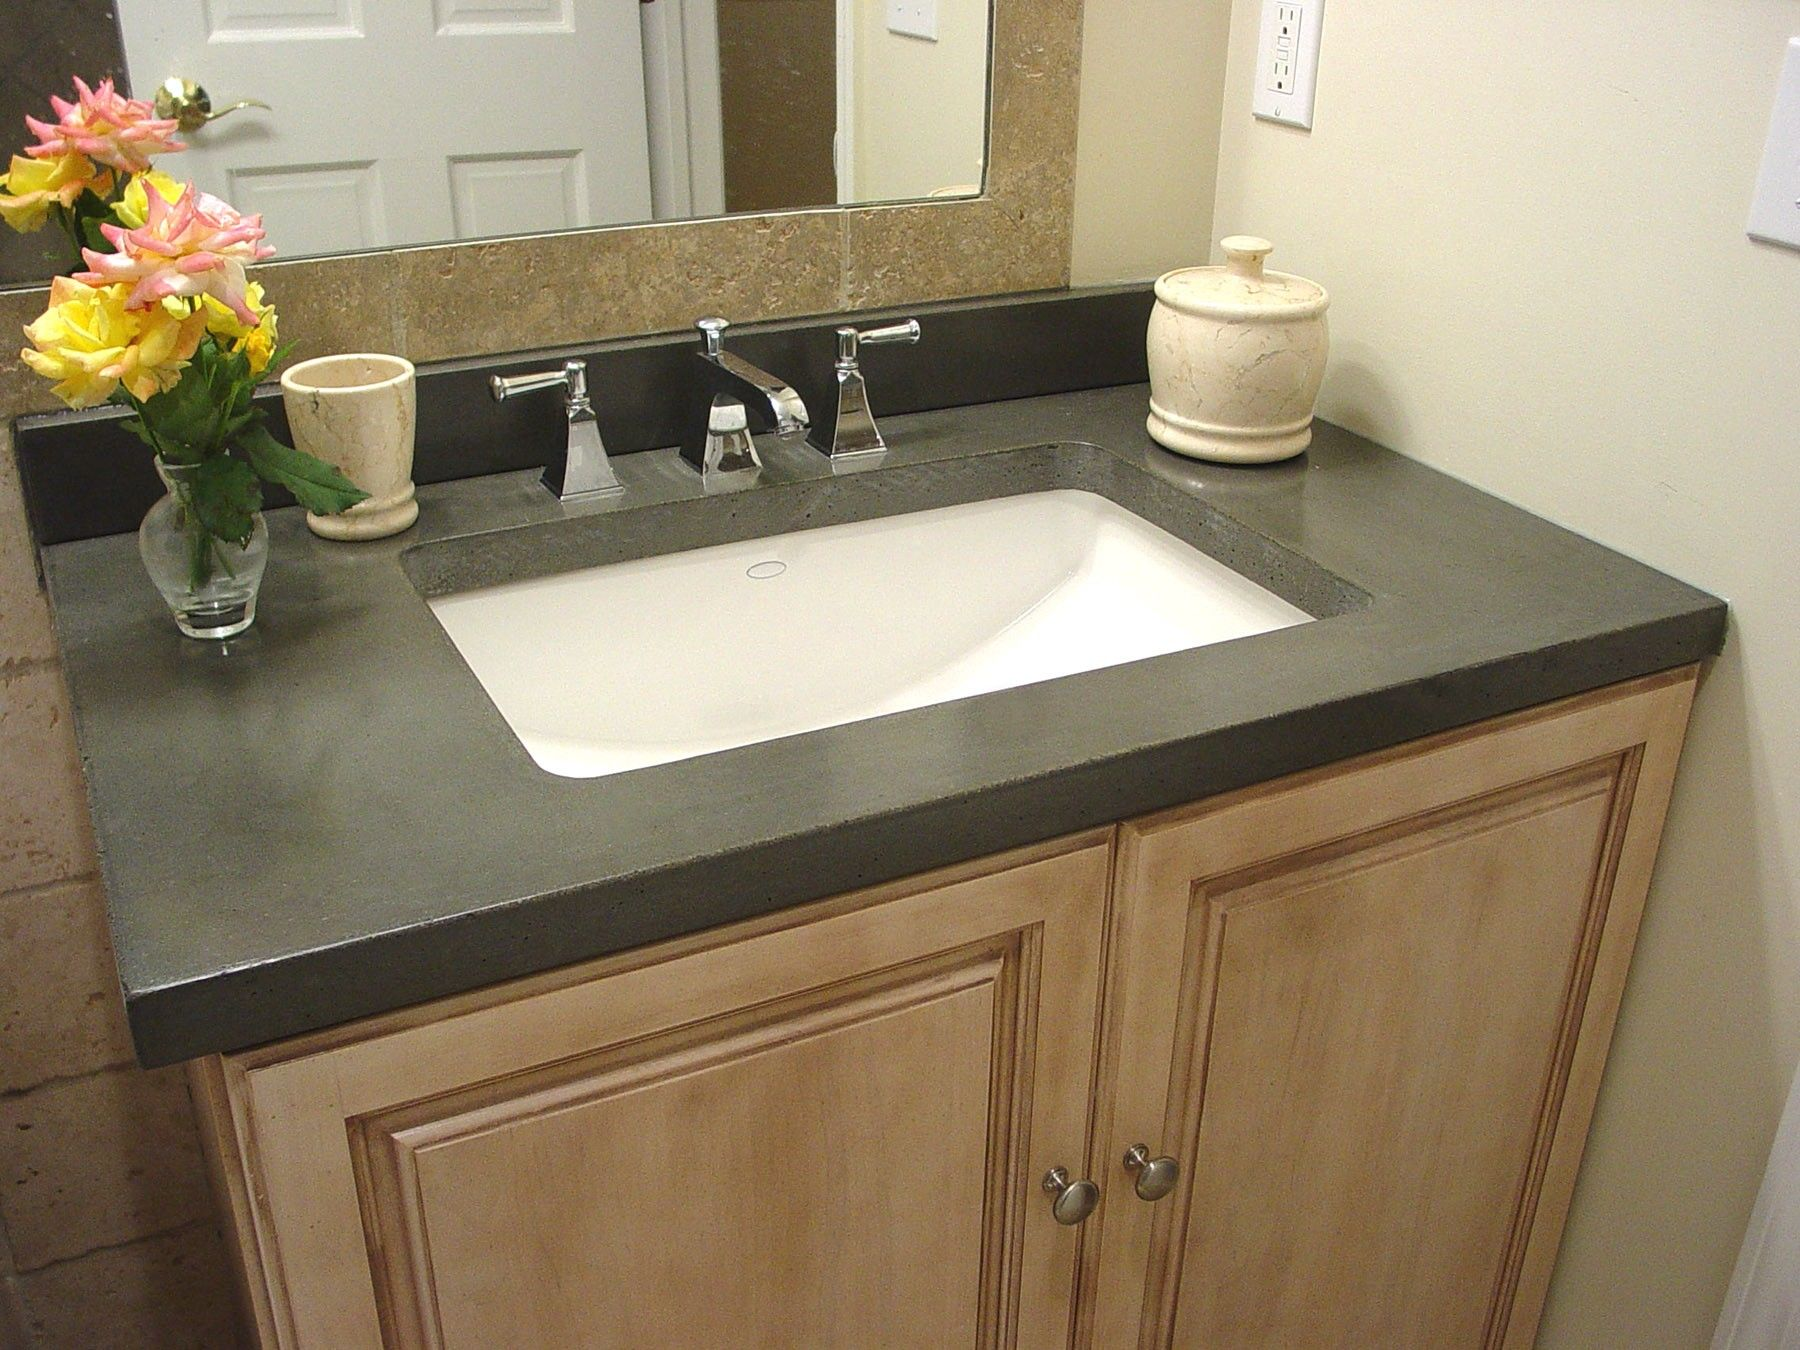 Dark Gray Plain Granite Flat Eased Countertop On Ivory Polished Oak Wood Bathroom Home Depot Bathroom Vanity Concrete Countertops Bathroom Small Bathroom Decor